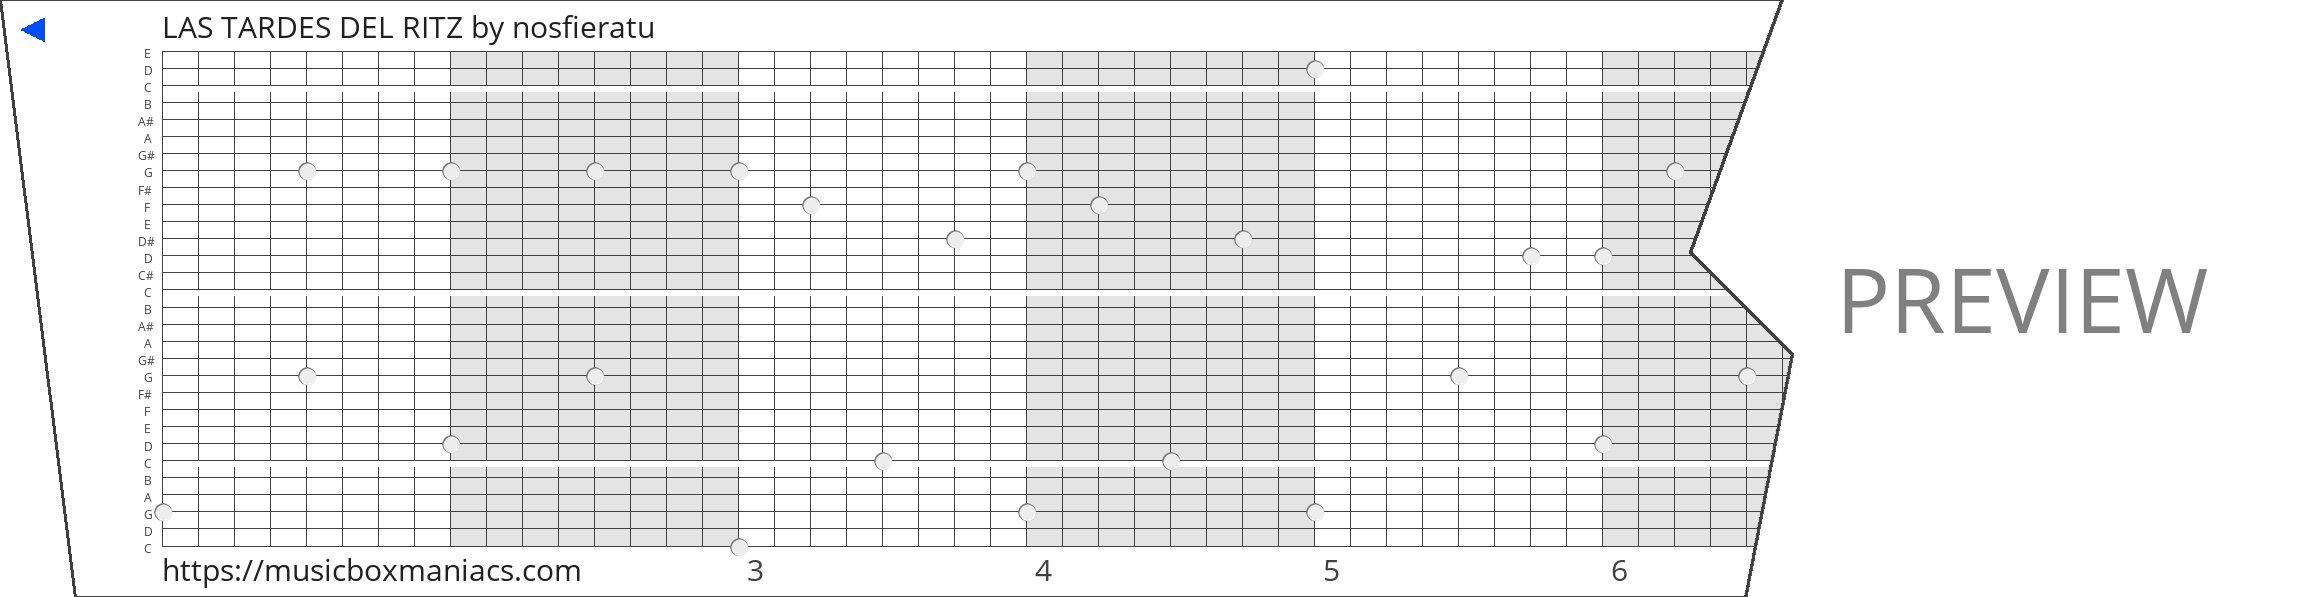 LAS TARDES DEL RITZ 30 note music box paper strip